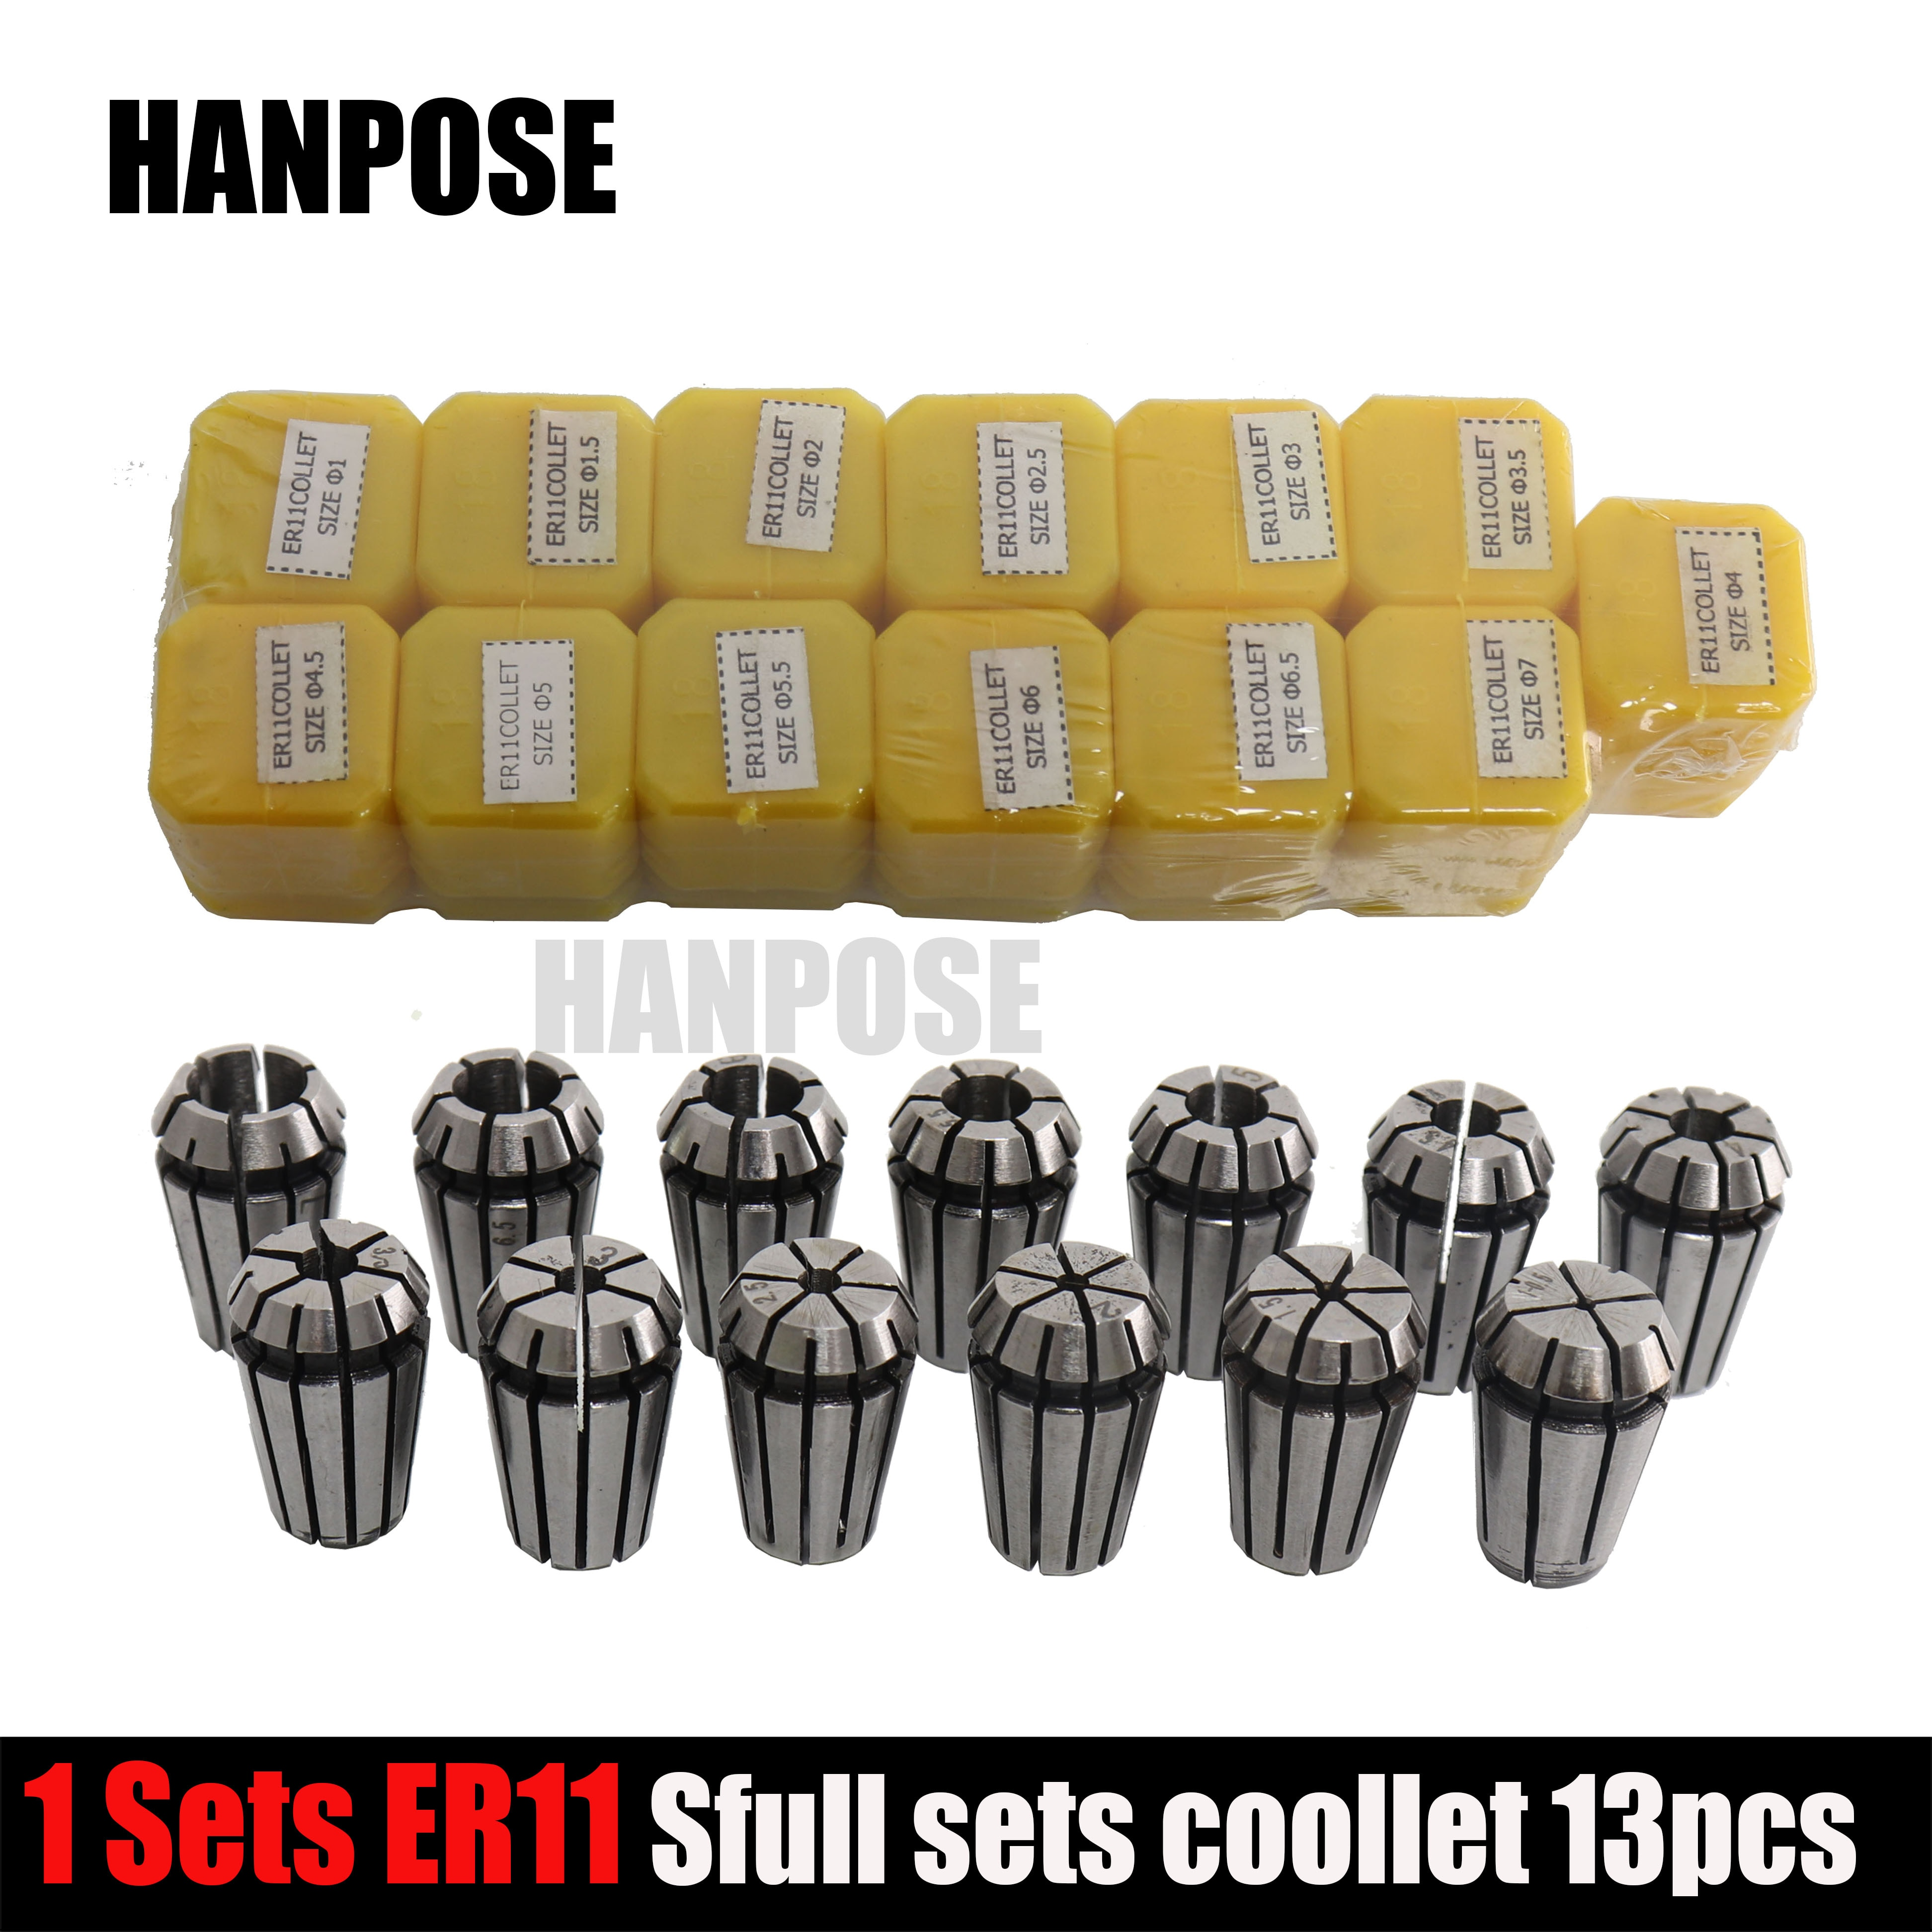 13Pcs ER11 Collet chuck cnc Spindle ER11 Collet lathe tool holder Pinza ER11 Collet set from 1-7MM for CNC milling lather tool